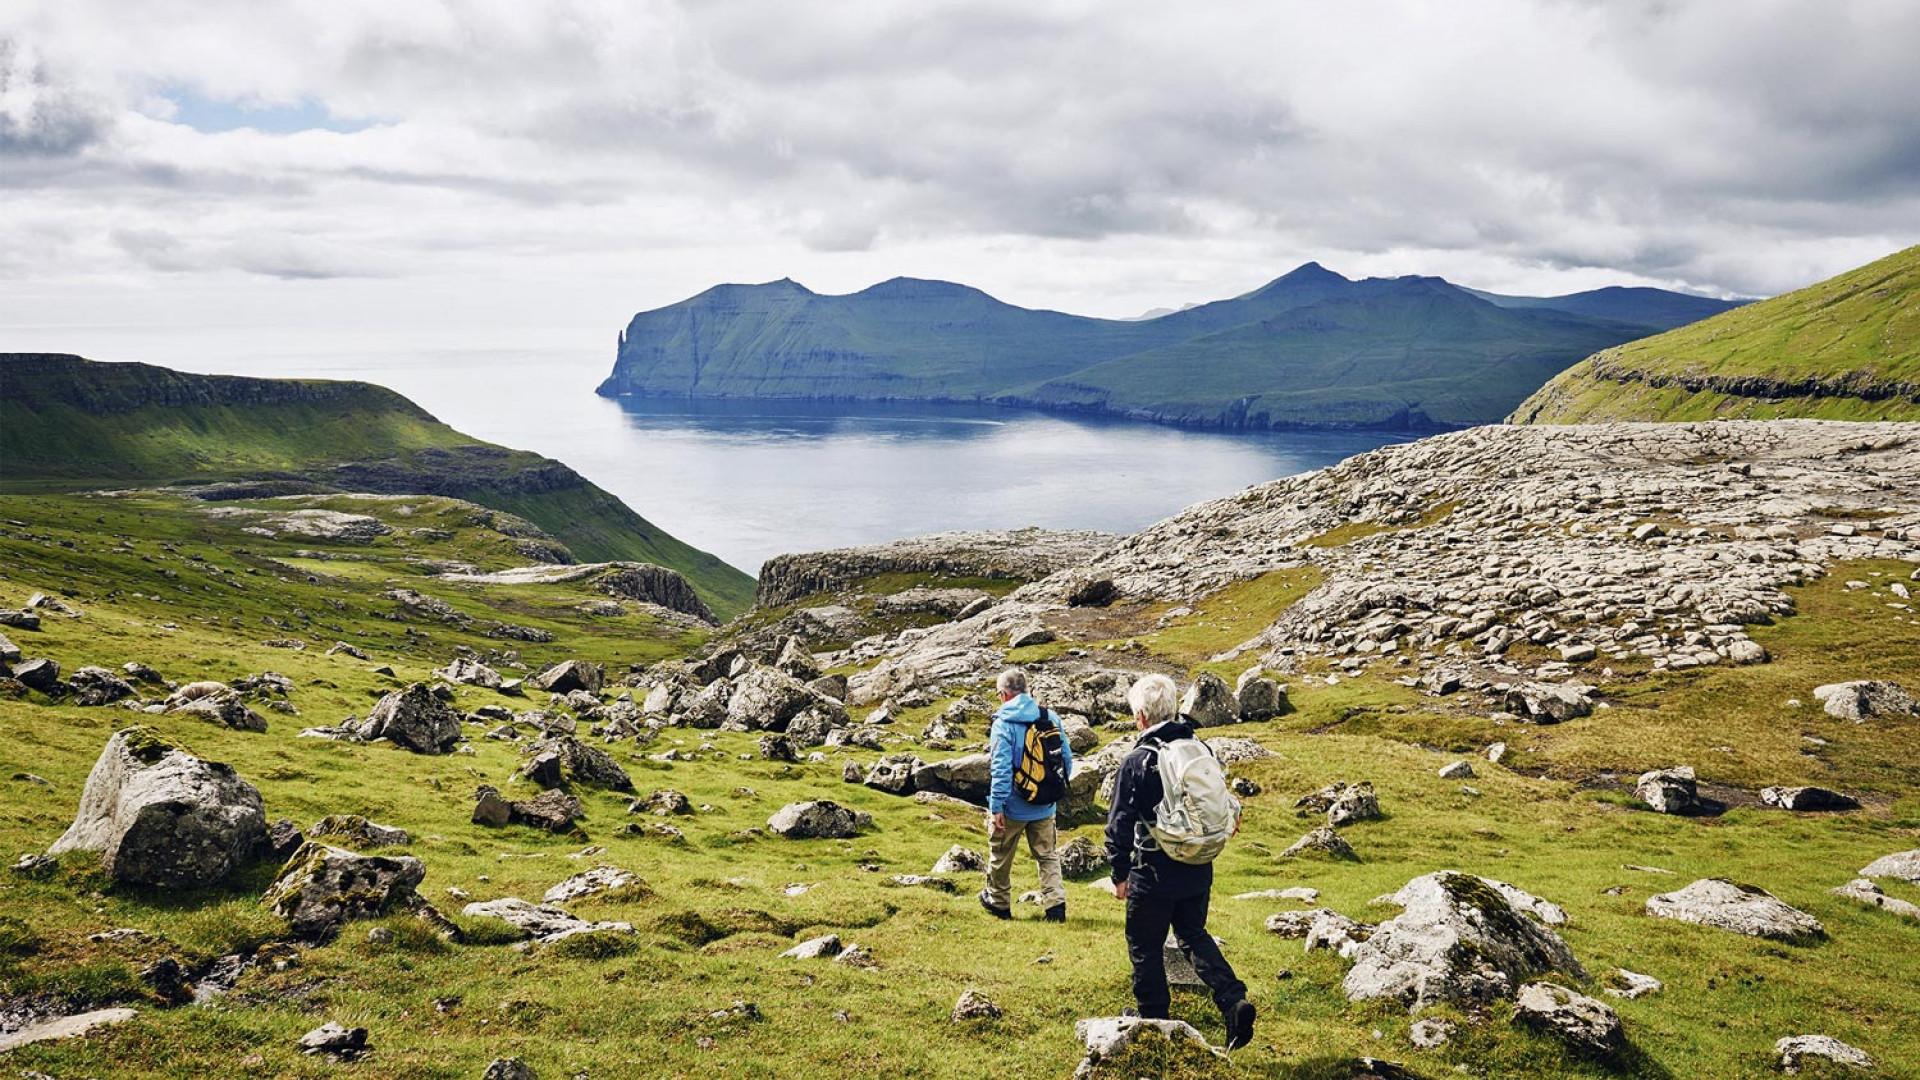 Hiking along the coast in the Faroe Islands